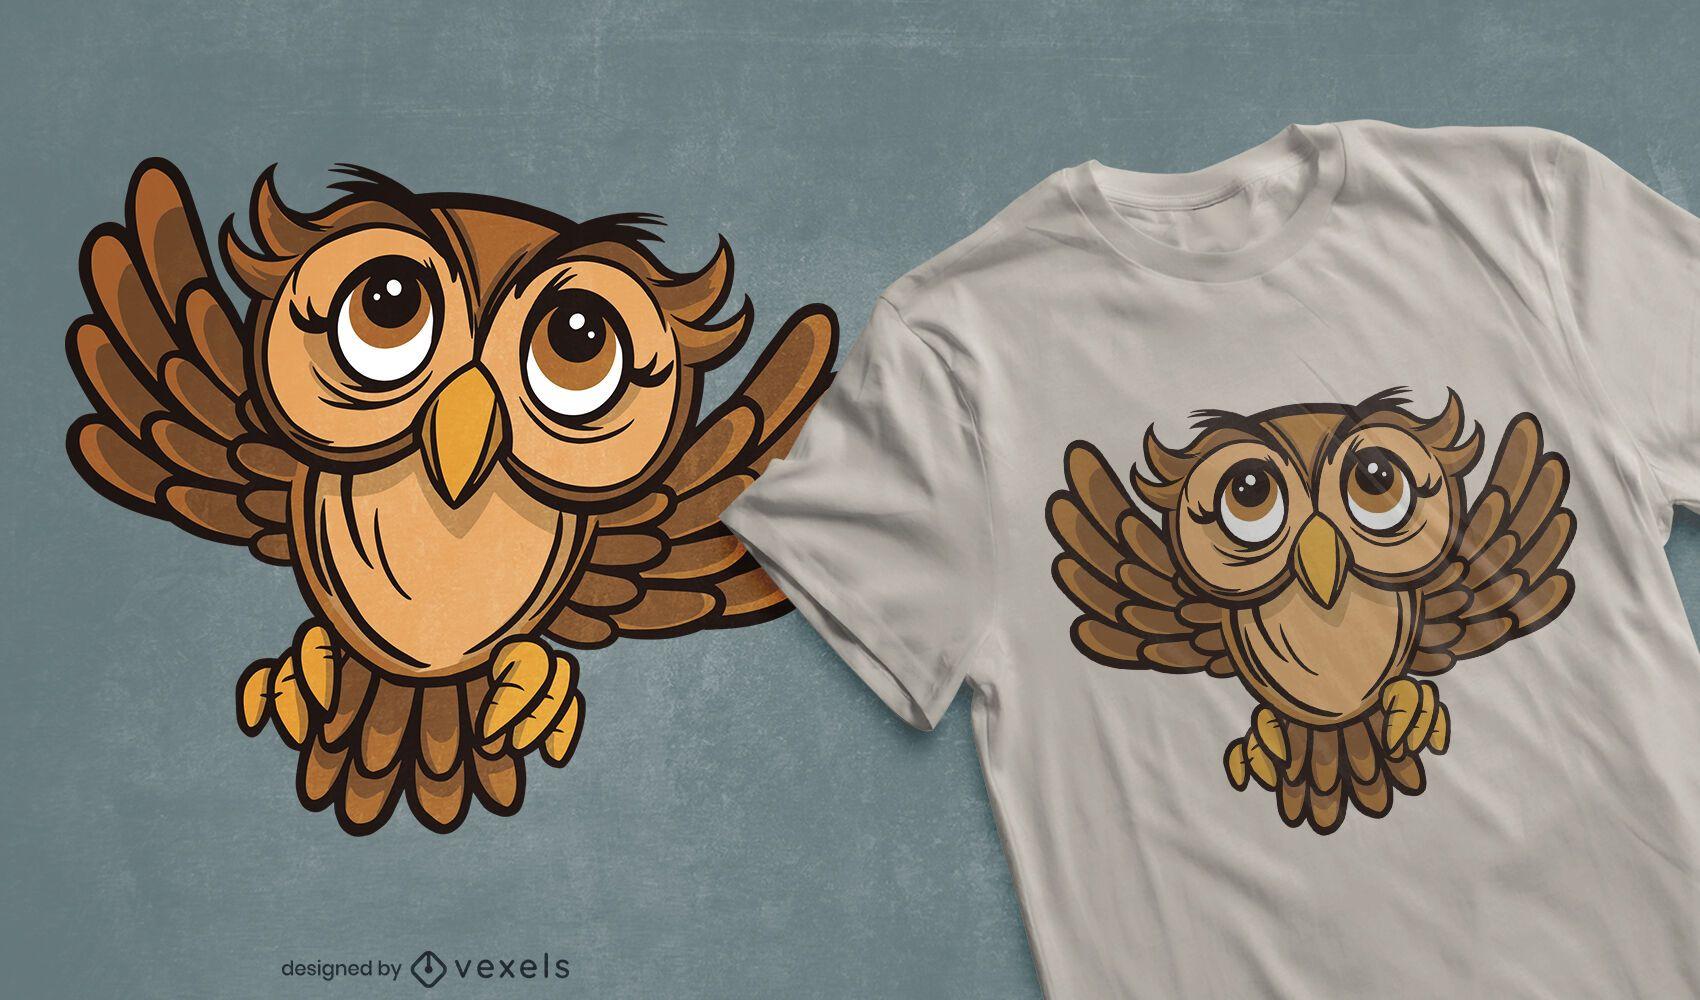 Big-eyed owl t-shirt design